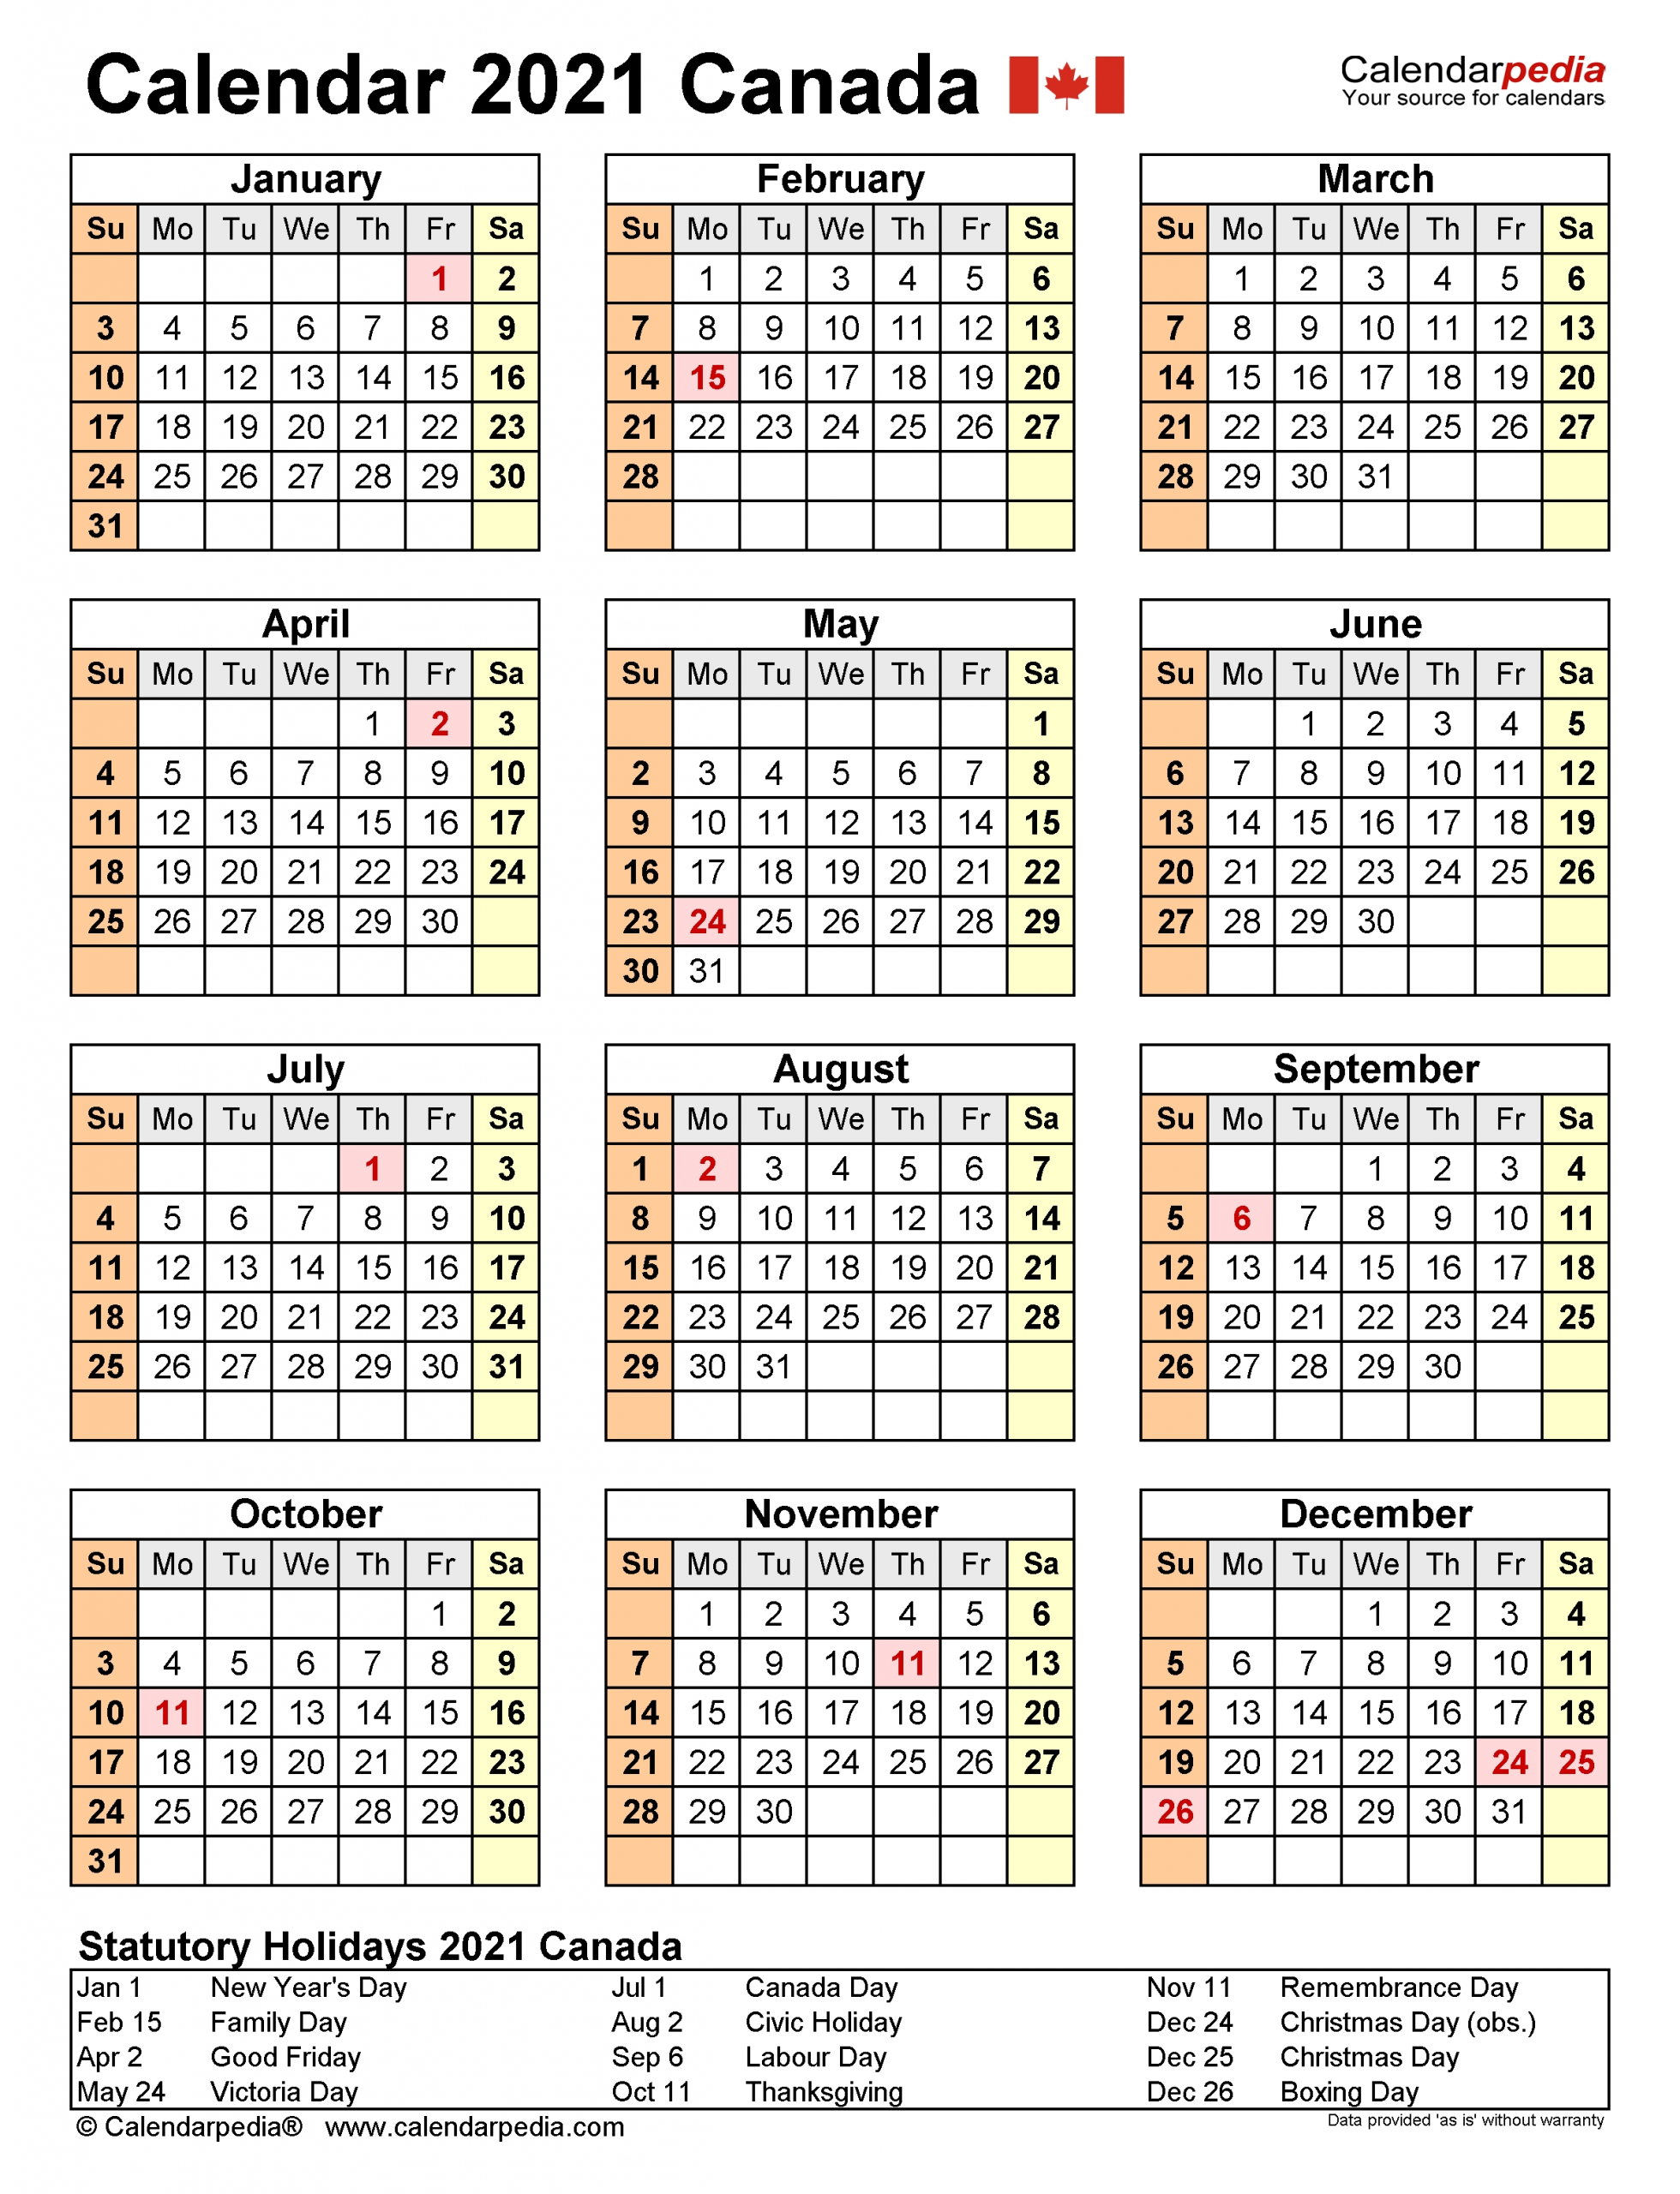 Canada Calendar 2021 - Free Printable Excel Templates-Attendance Calendars 2021